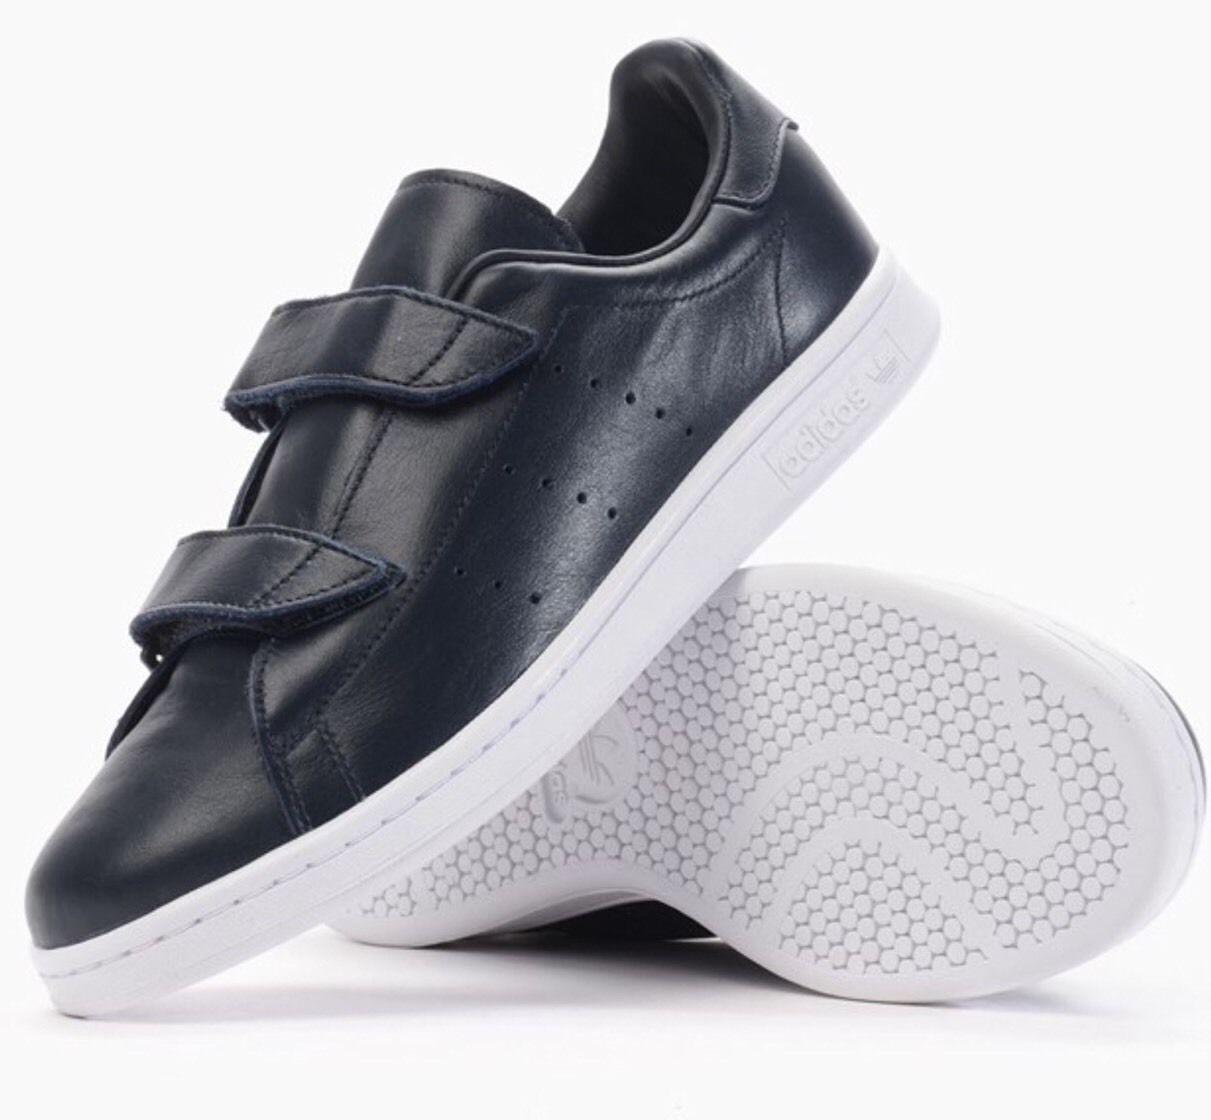 Adidas Originals Hyke veloce AOH-005 X blu scuro in pelle unisex tg